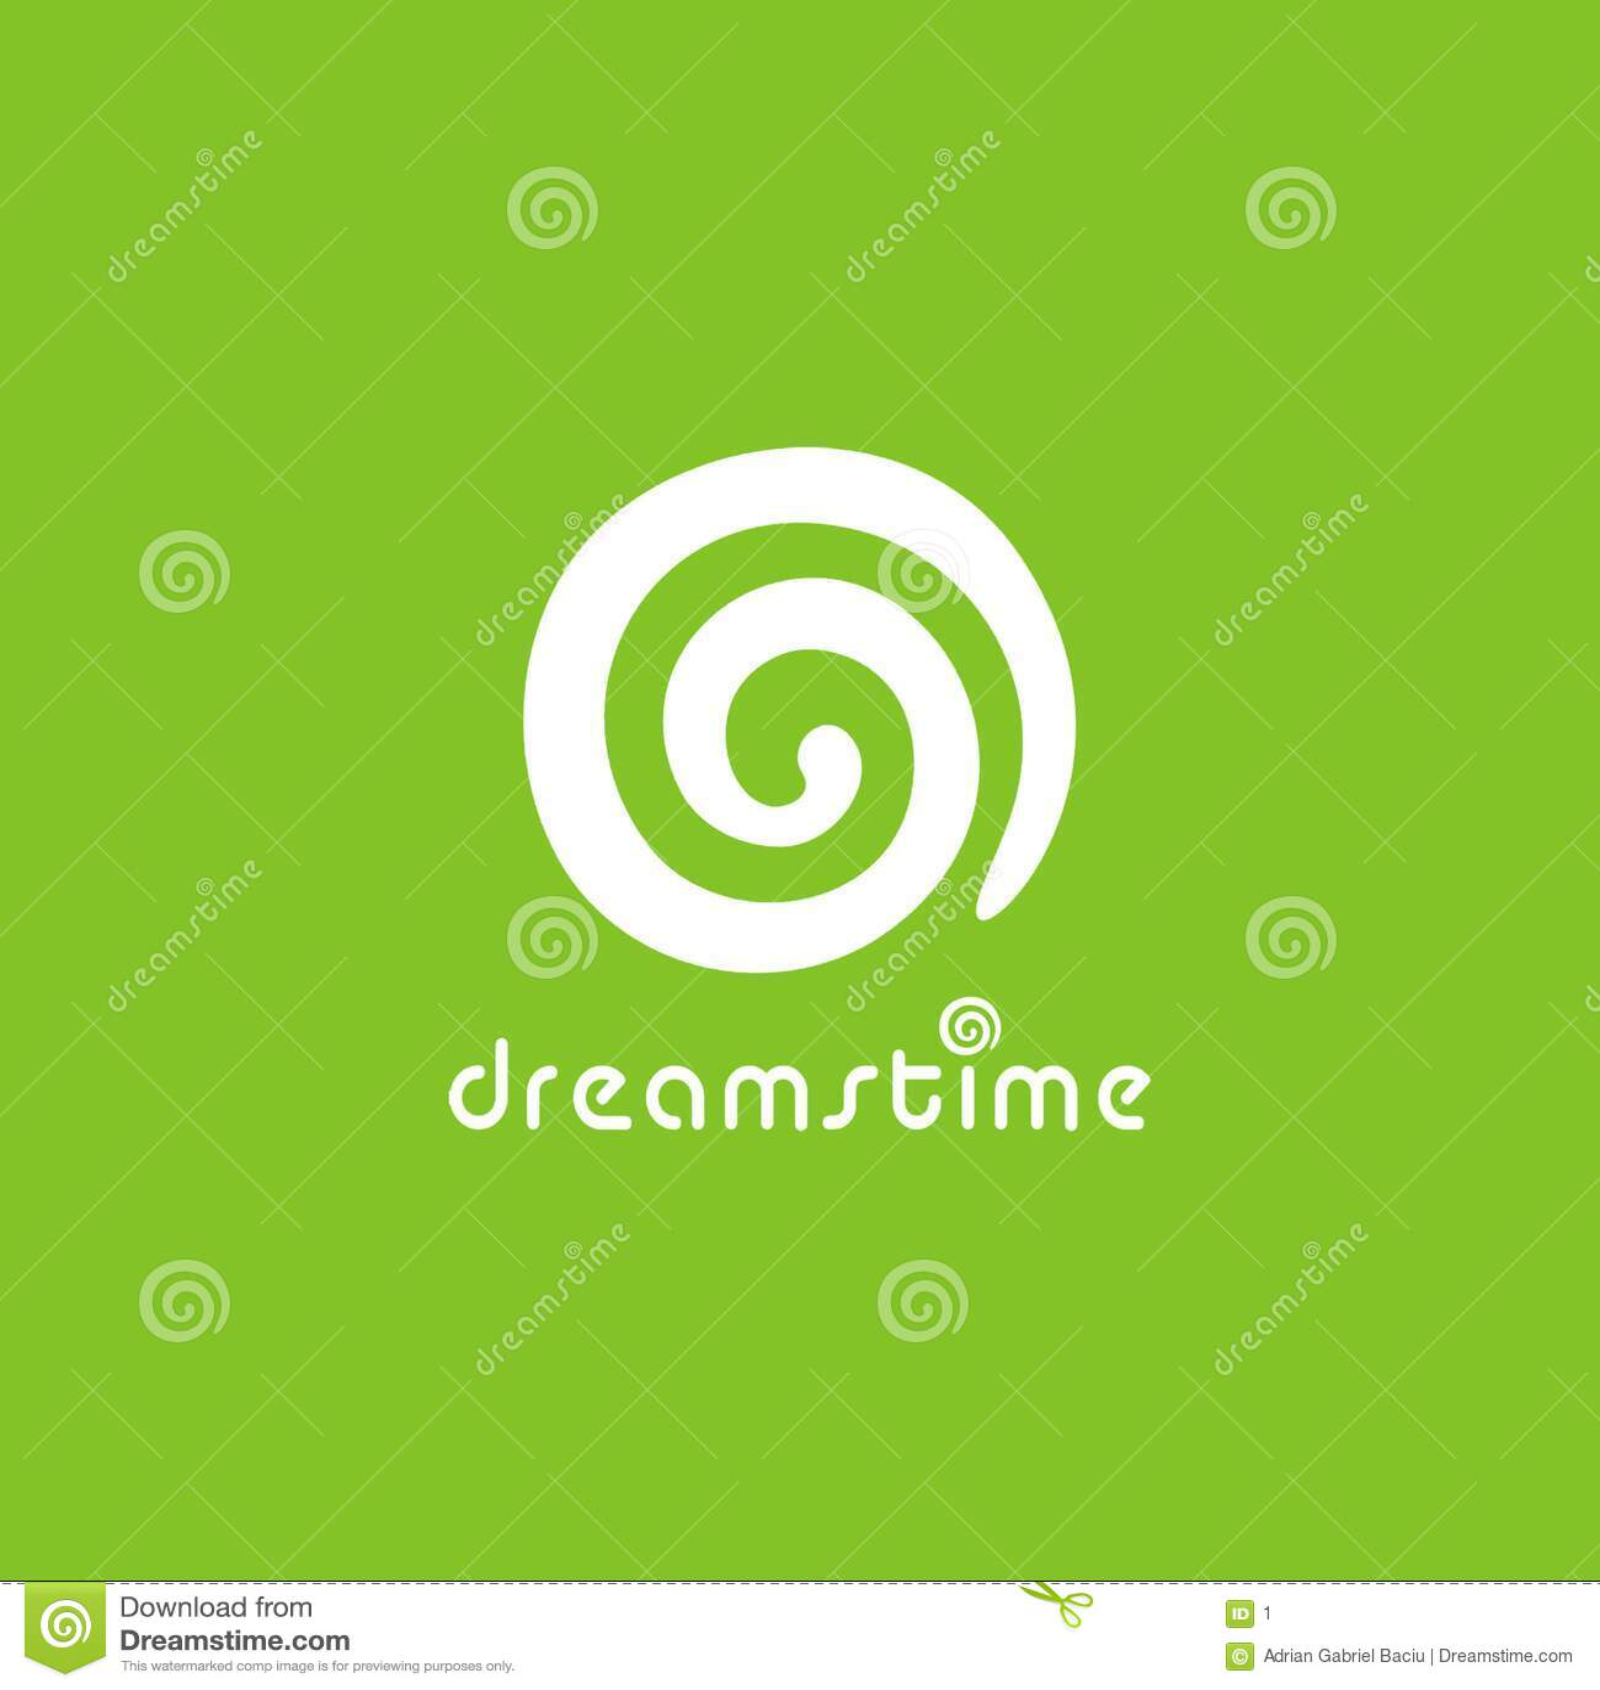 Dreamstime generic image